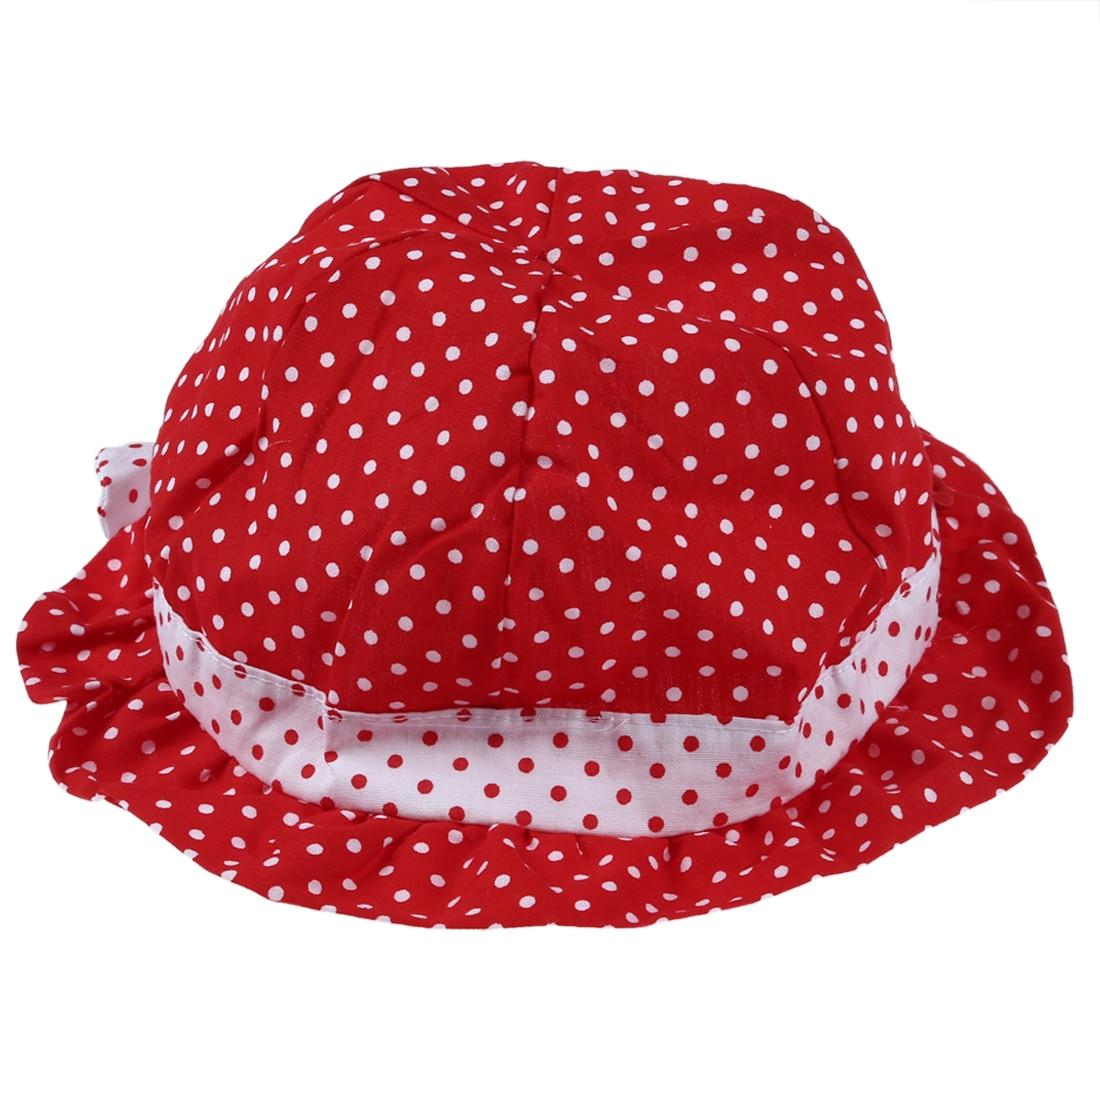 New Sweet Cute Baby children so Polka Summer Caps red